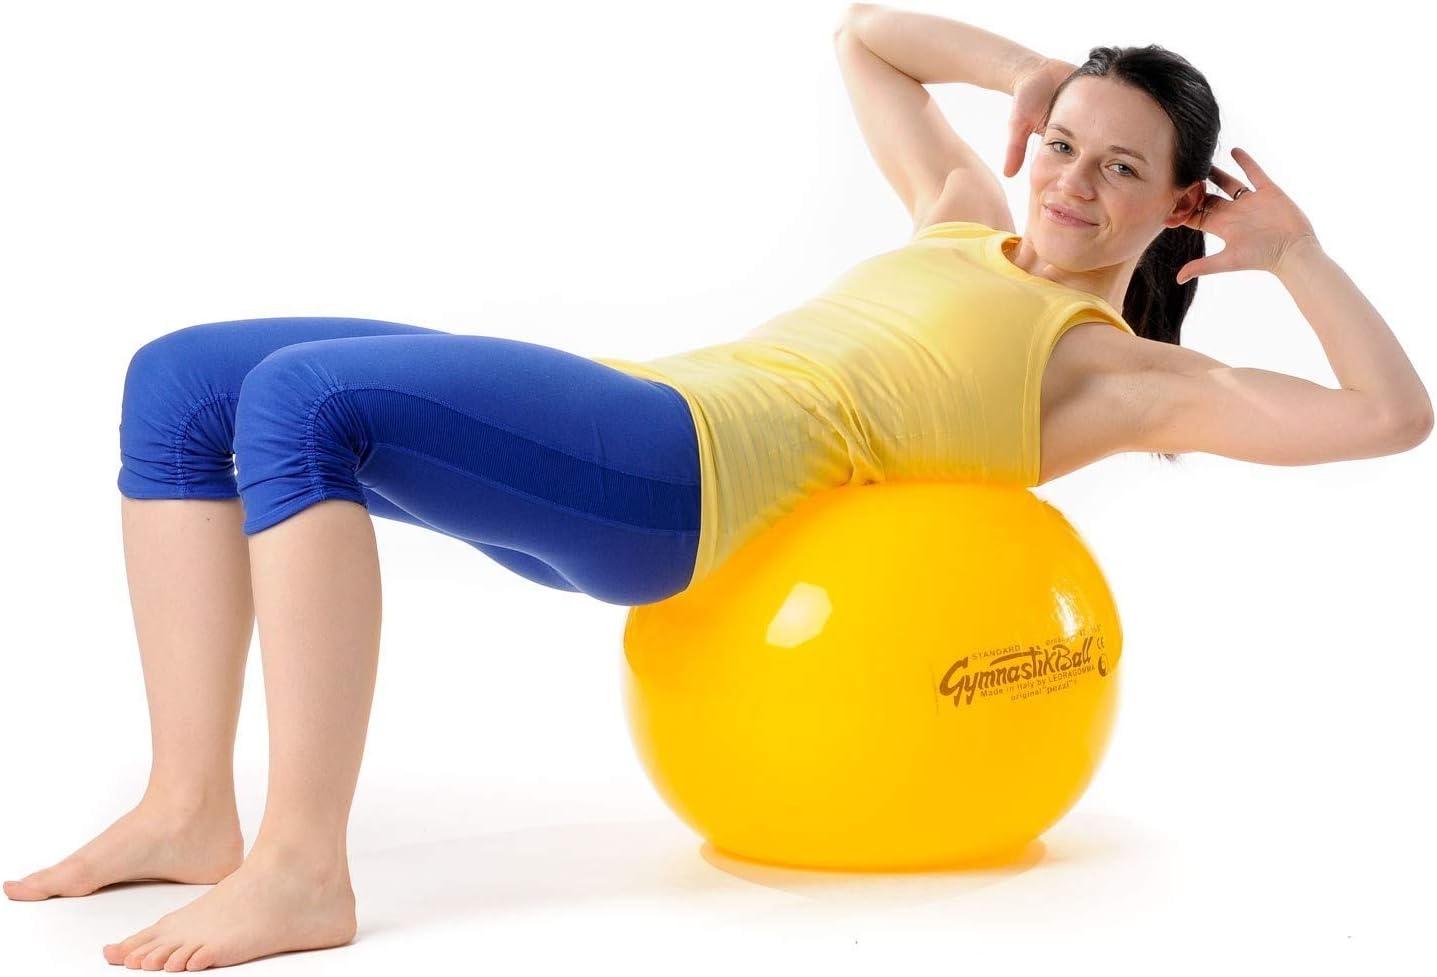 PEZZI Original Gymnastikball Standard Sitzball Set /Ø 42 cm bis 75 cm inkl Oliver Ballpumpe bis 400 kg belastbar Training Fitness Reha Therapie